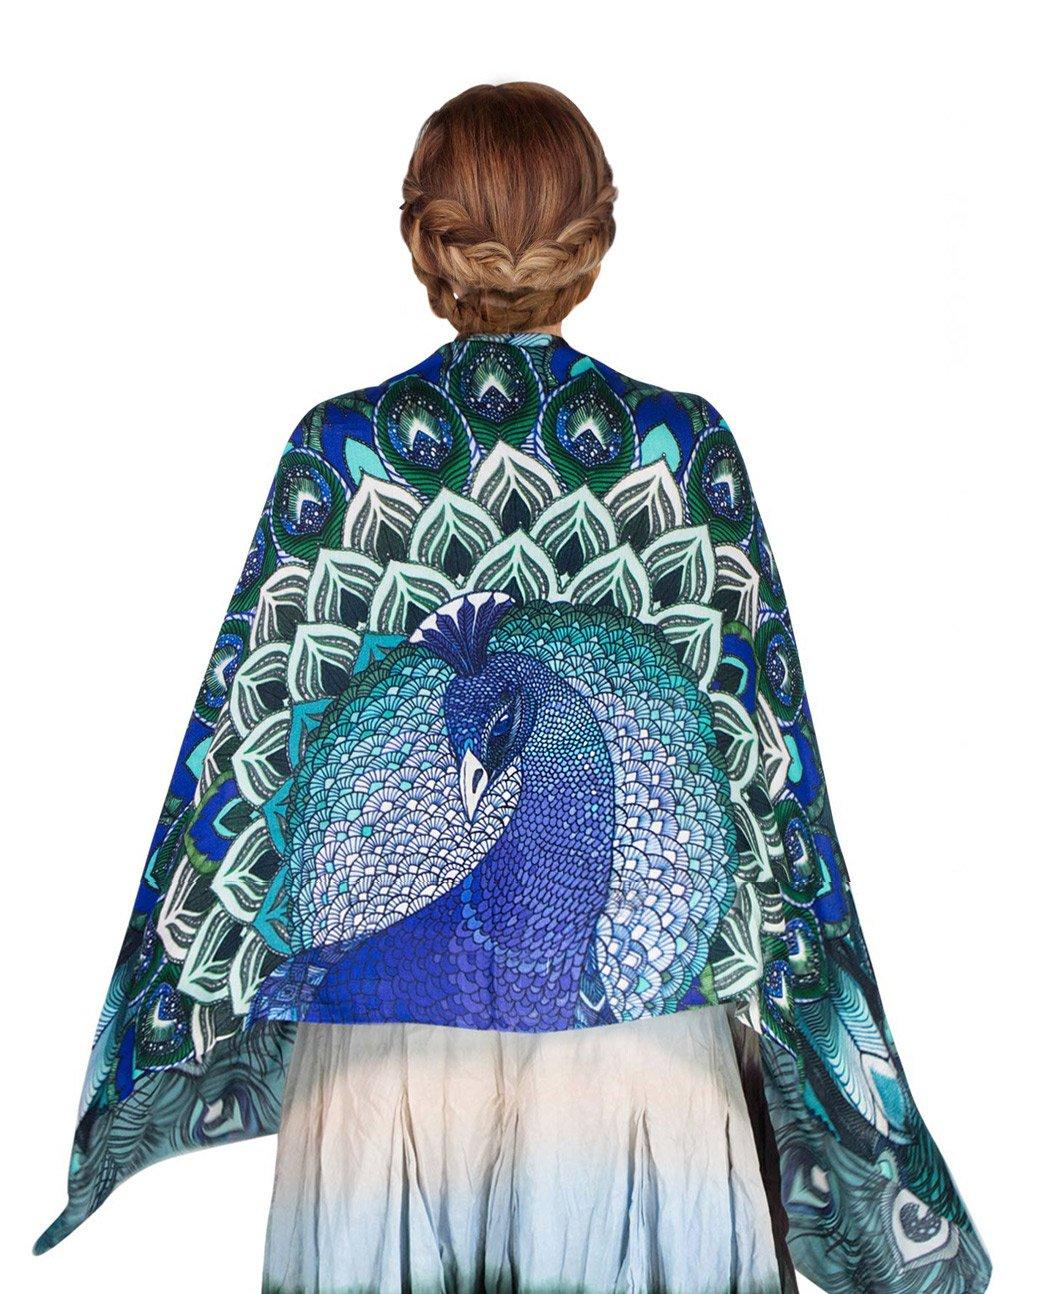 Aqua Peacock Scarf, 100% Silk hand painted Blue Winged Feather Wrap, Wedding Shawl by Shovava